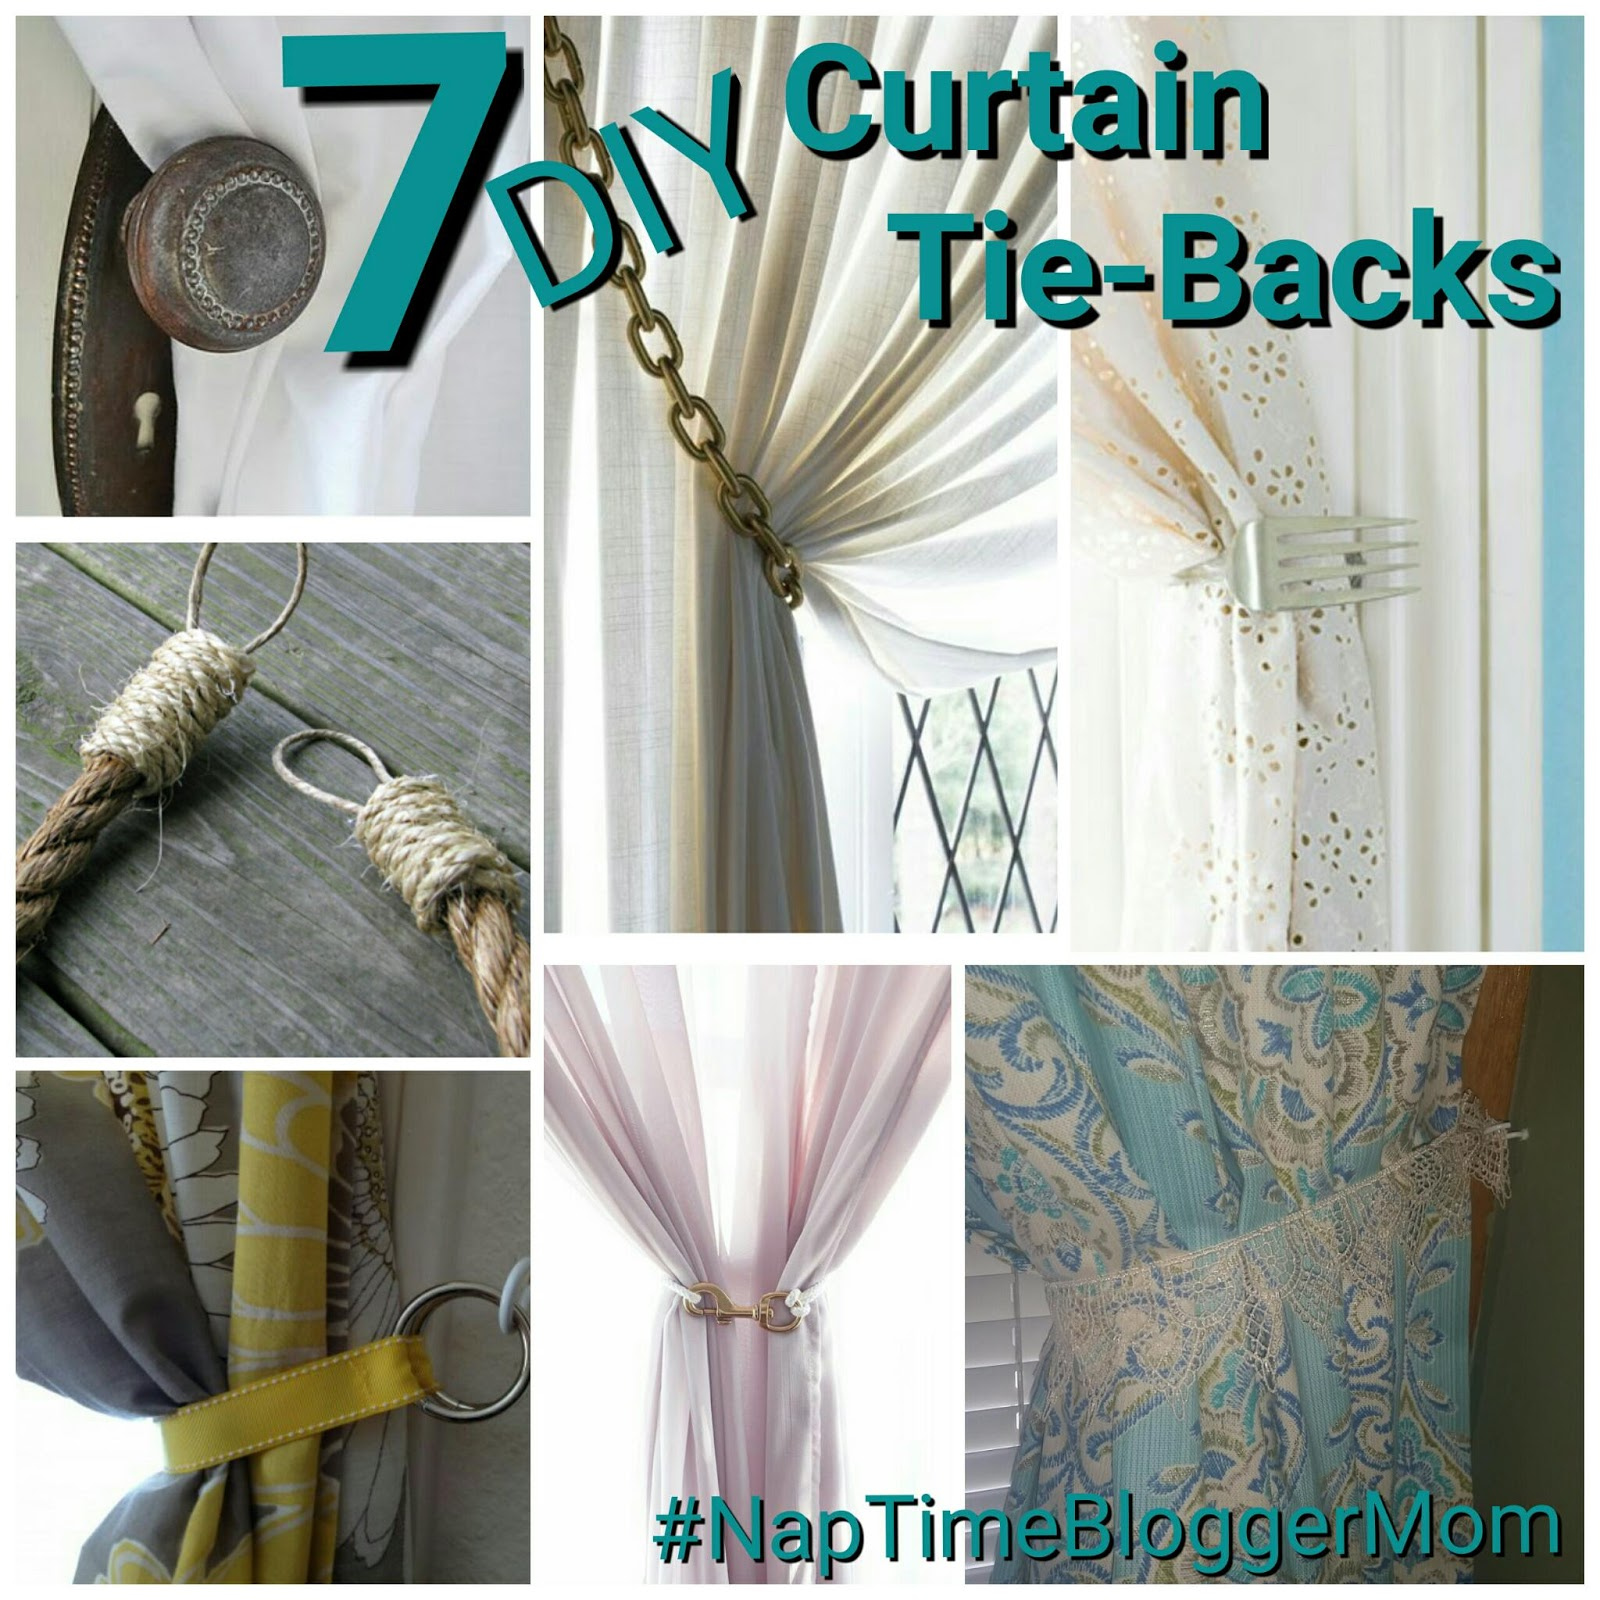 7 diy curtain tie backs